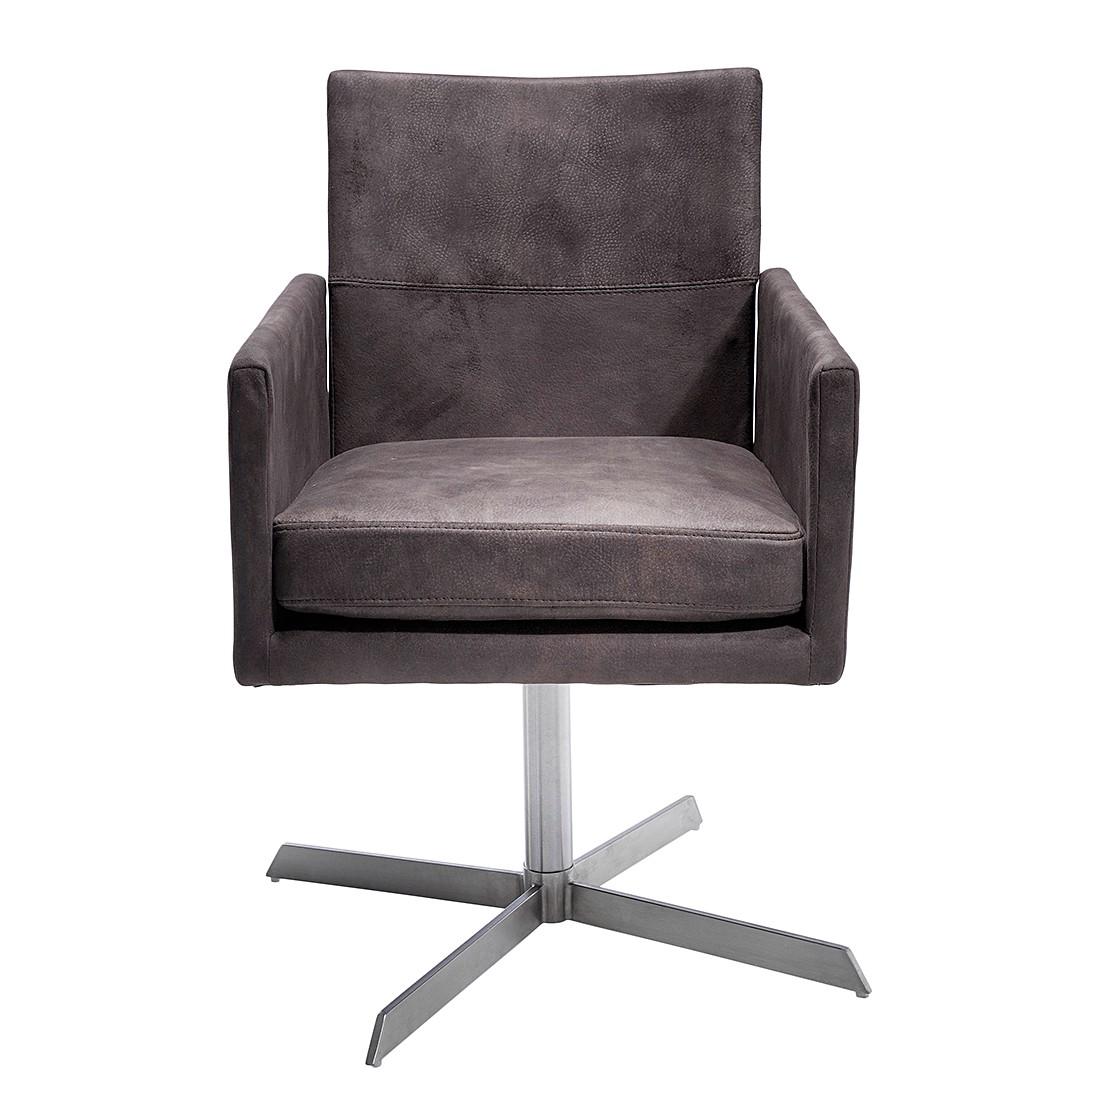 softline chaise pivotante design femi 5 comparer les. Black Bedroom Furniture Sets. Home Design Ideas